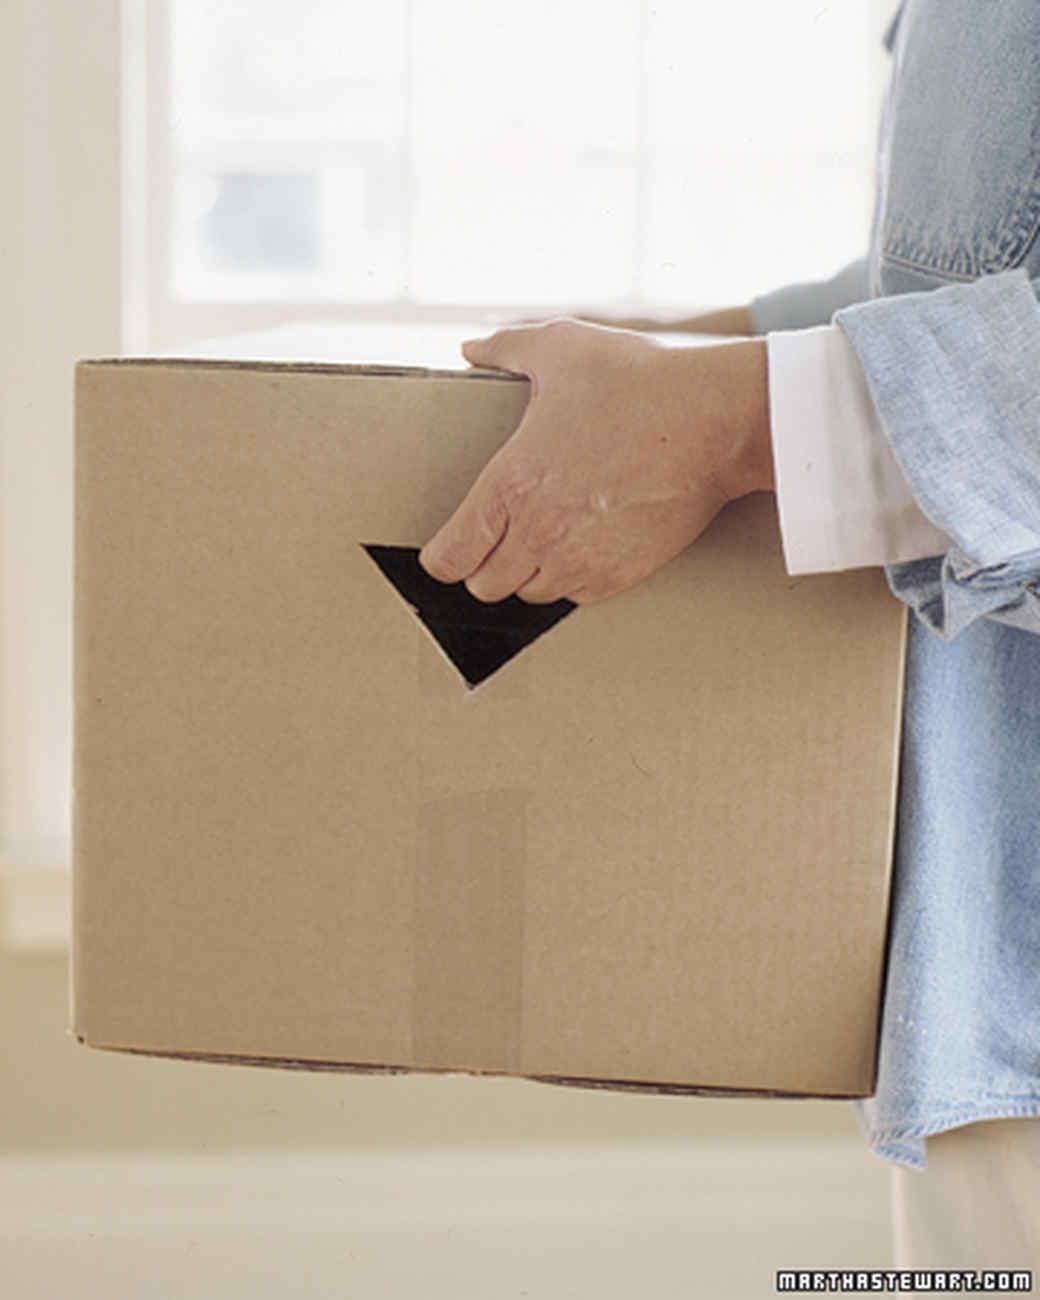 gt03sepmsl_movingboxhandle.jpg